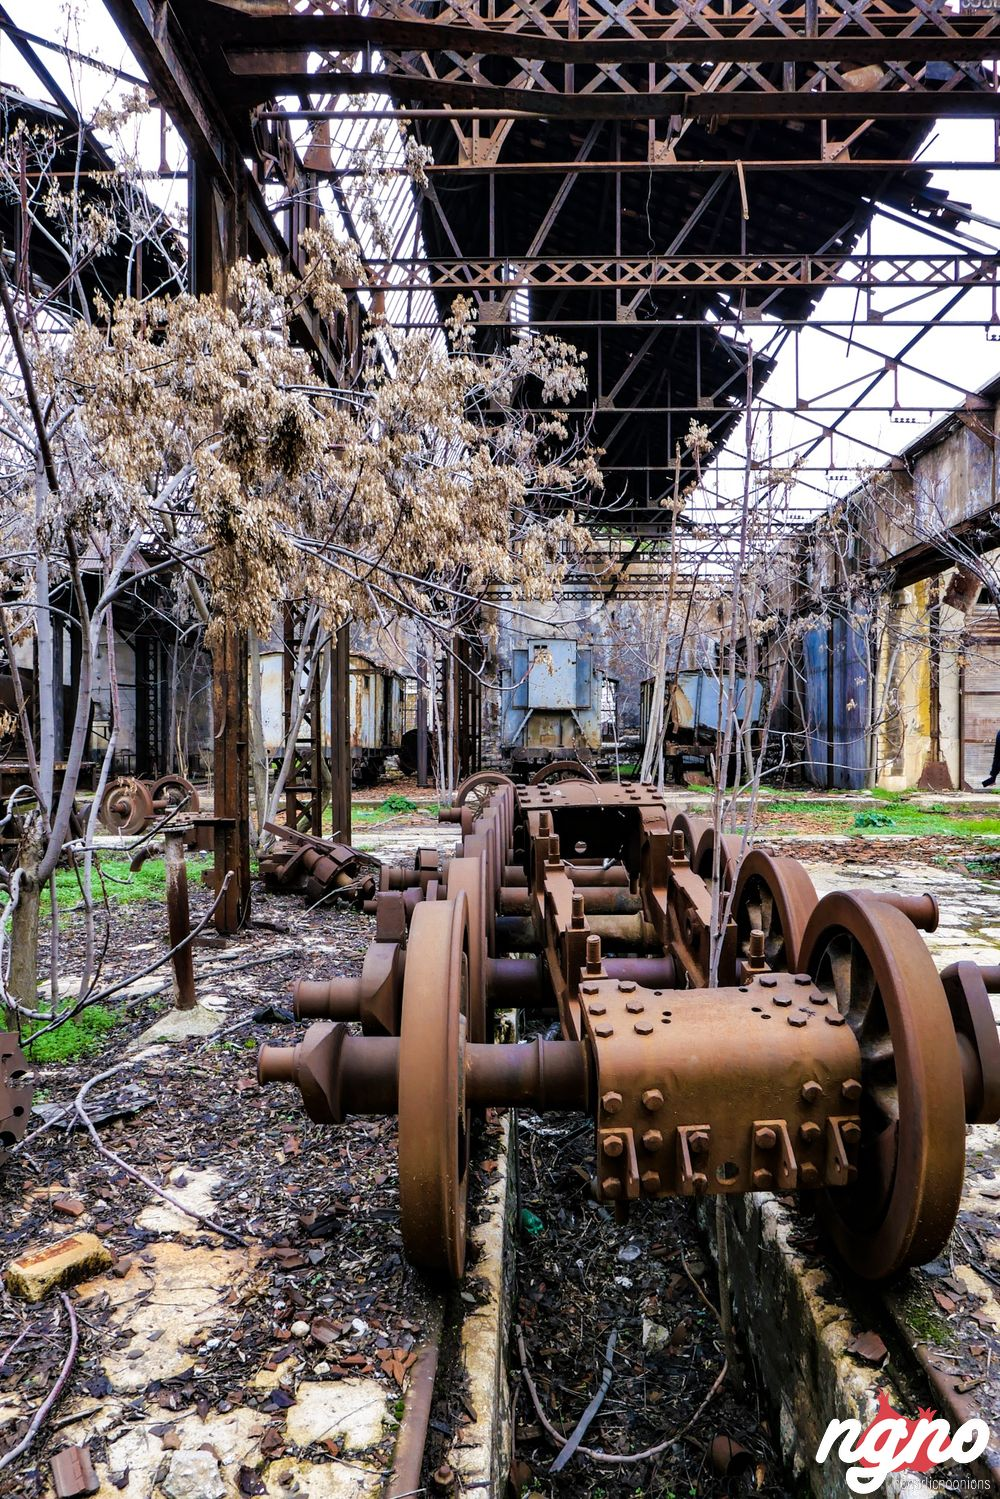 rayak-trainstation-lebanon-nogarlicnoonions-1032019-01-13-08-50-39